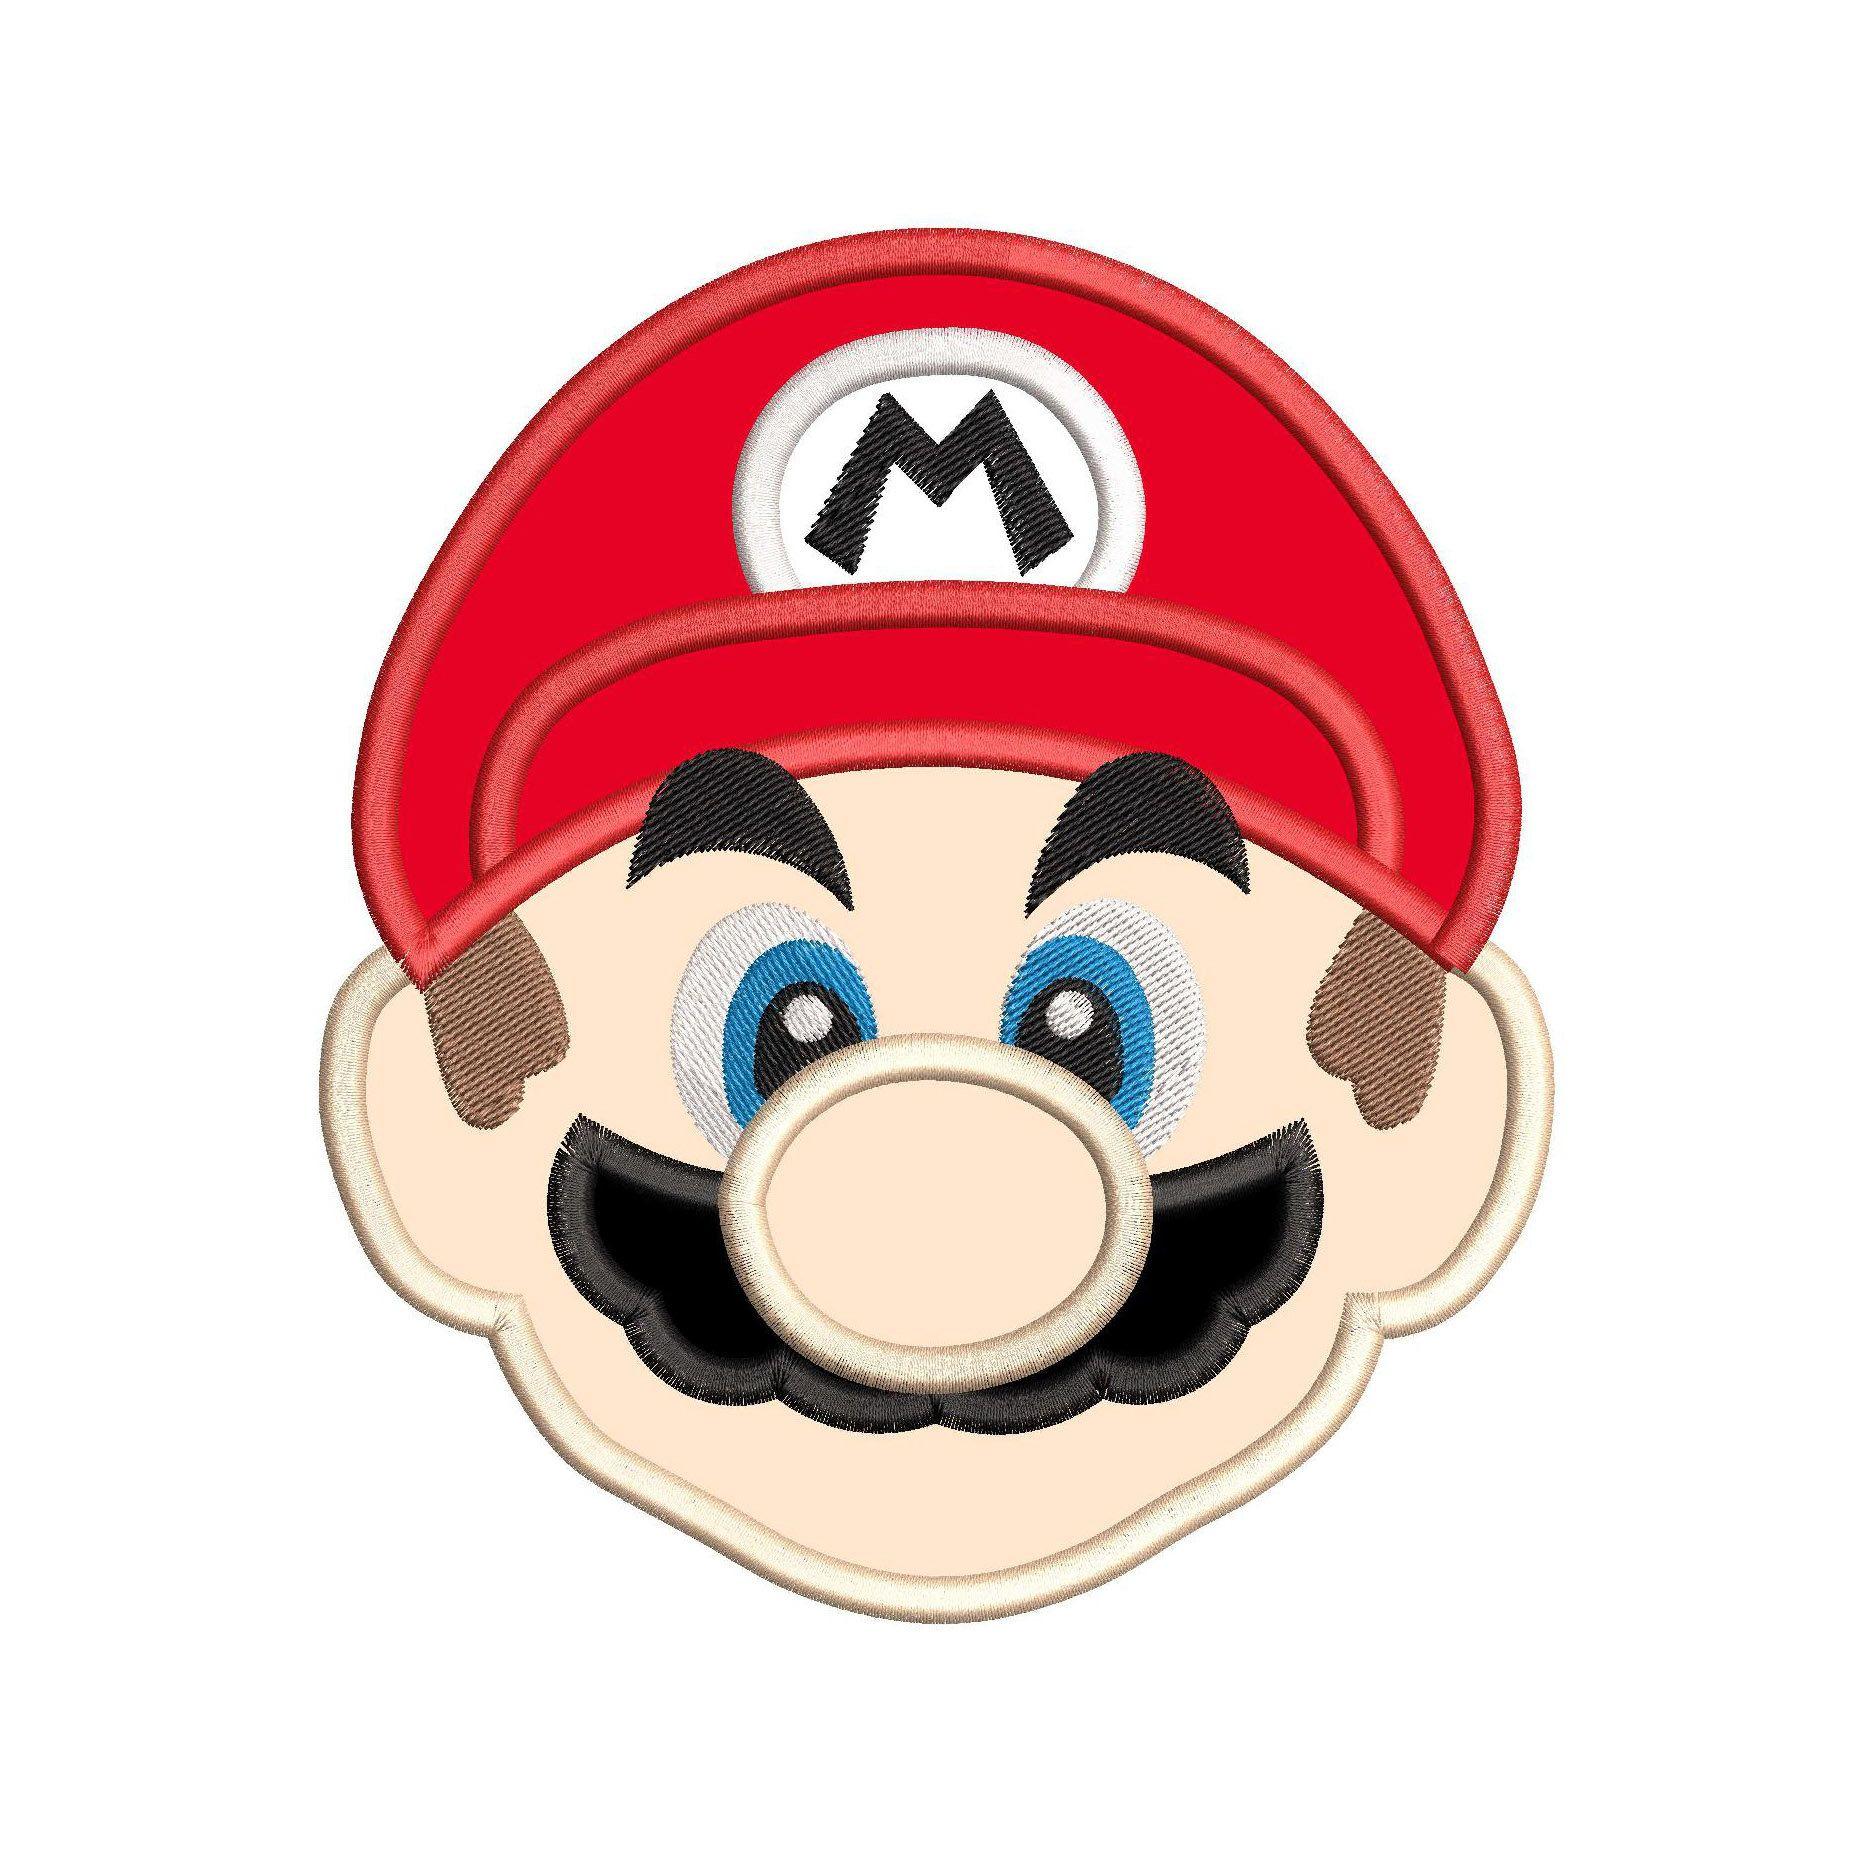 Super Mario Head Applique Embroidery Design Instant Download Embroidery Applique Applique Embroidery Designs Applique Quilts